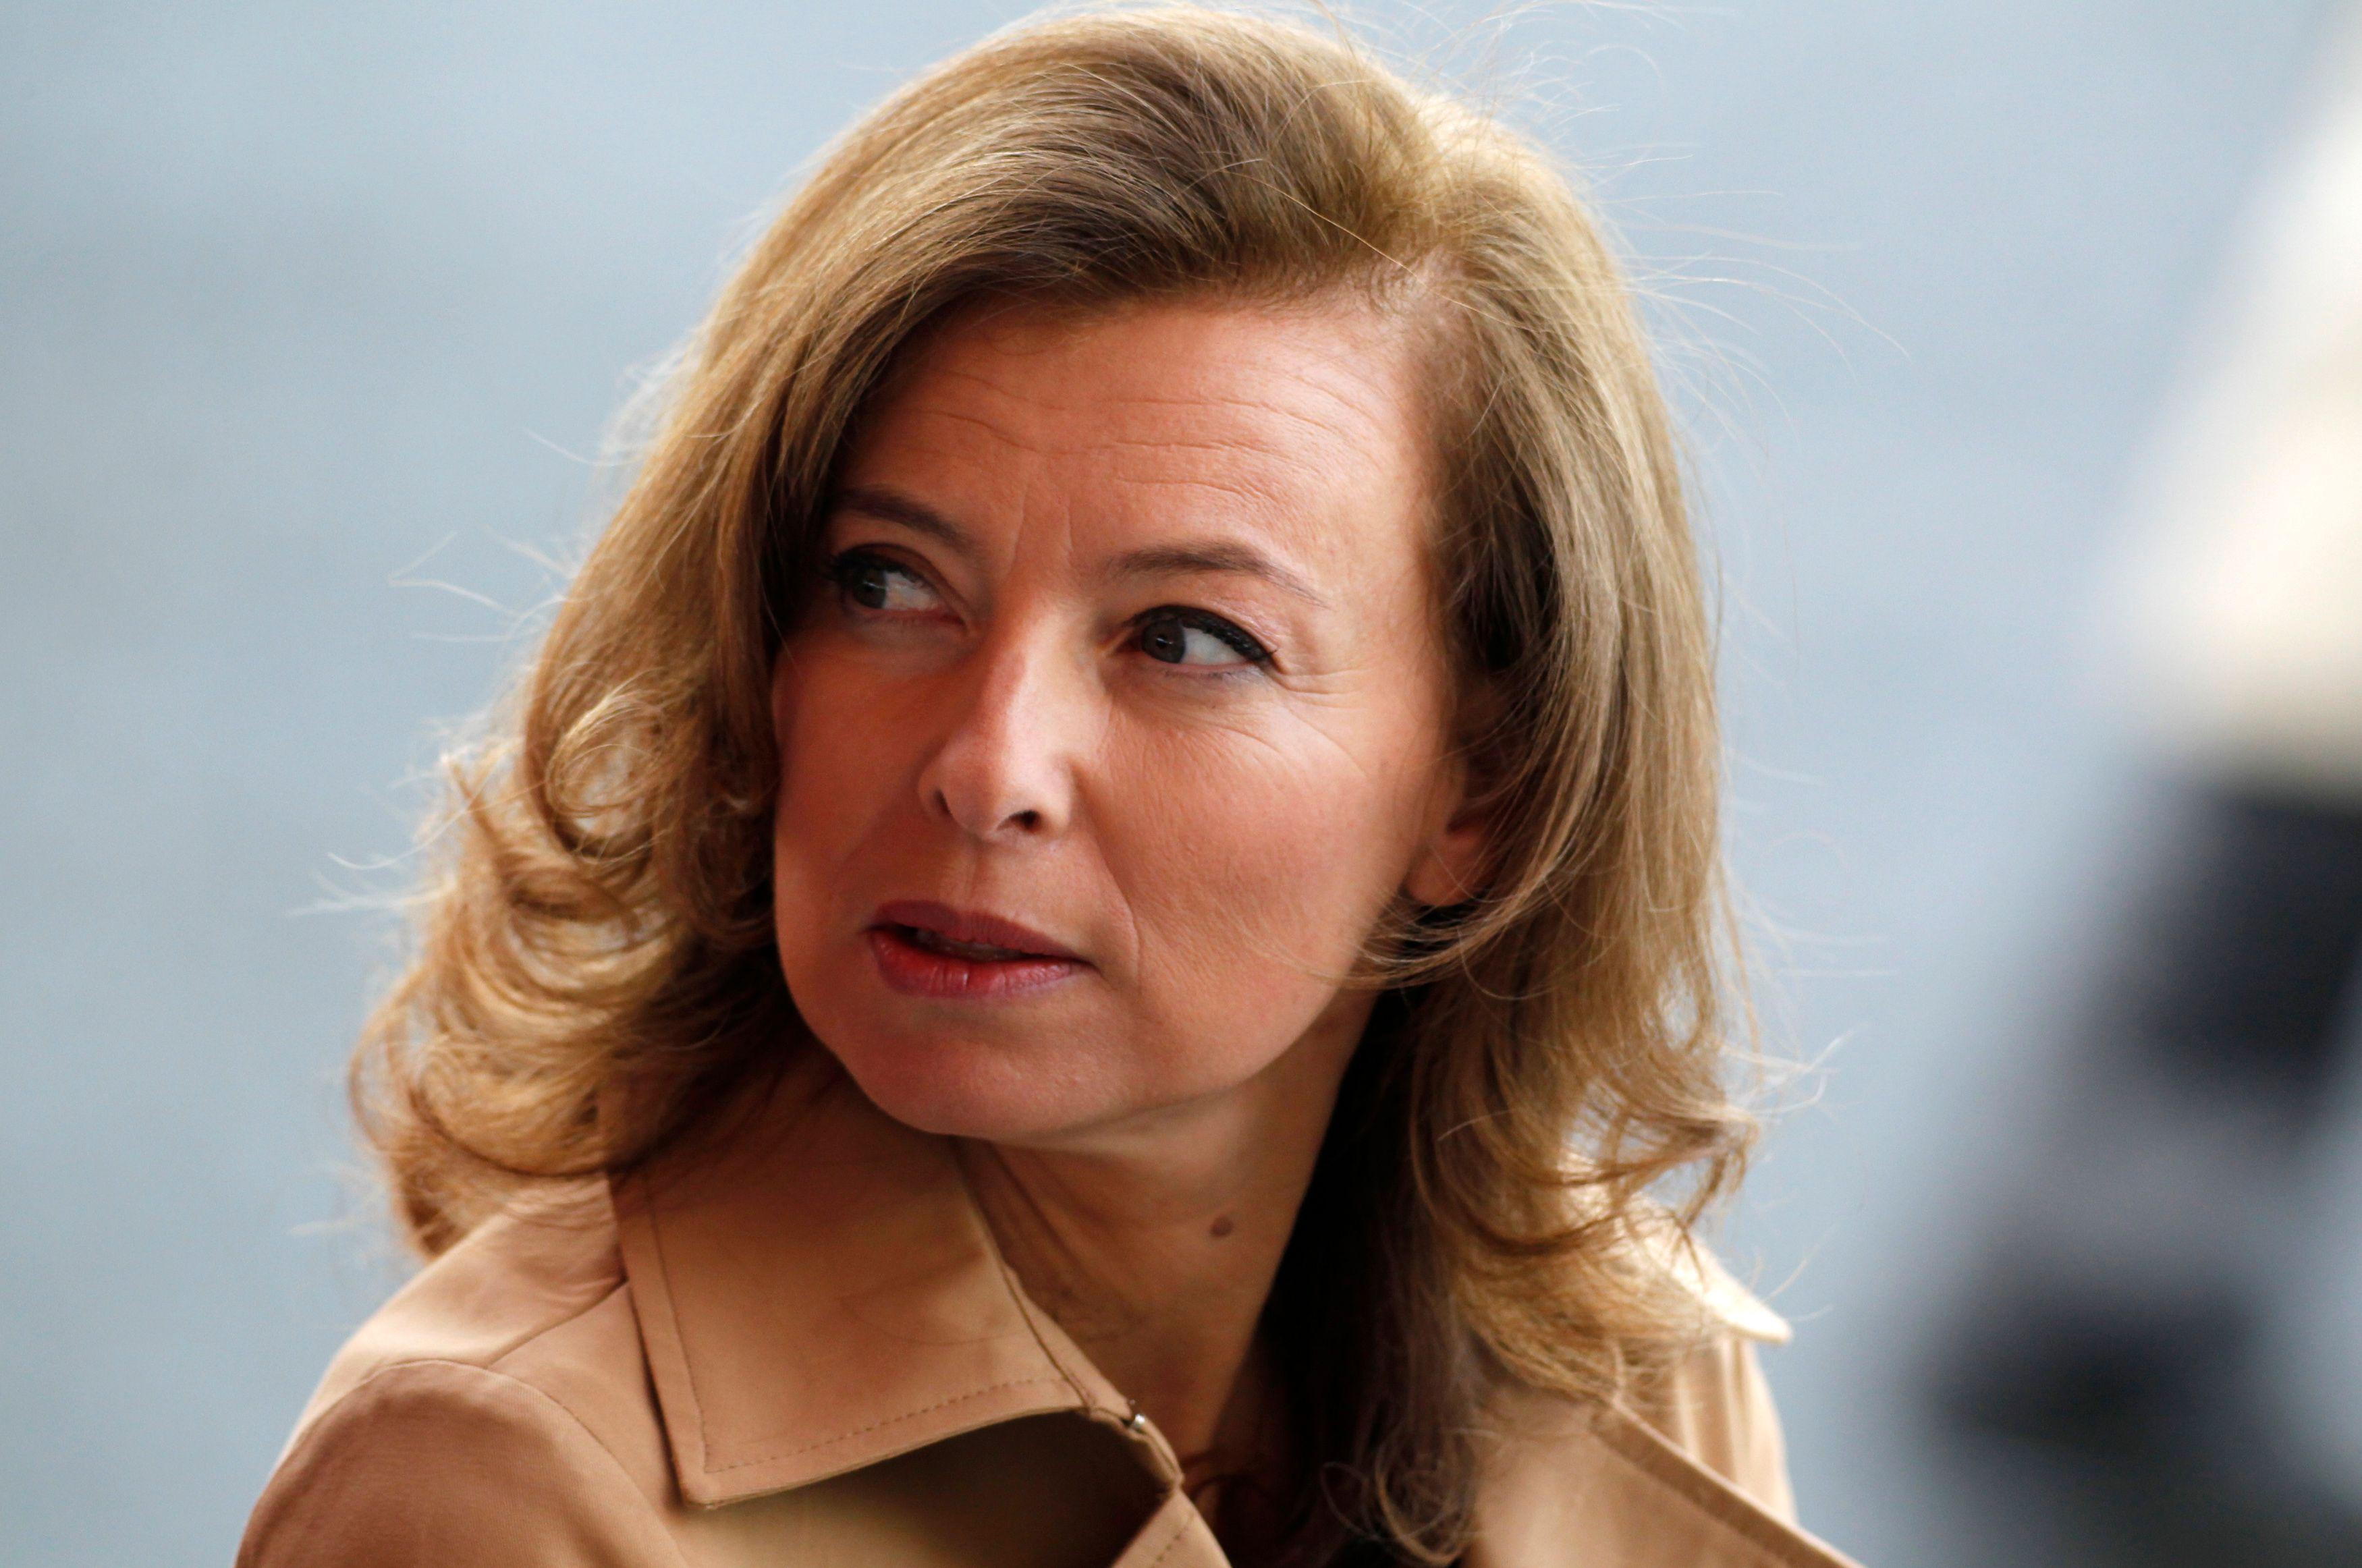 YouPorn propose à Valérie Trierweiler un poste d'ambassadrice